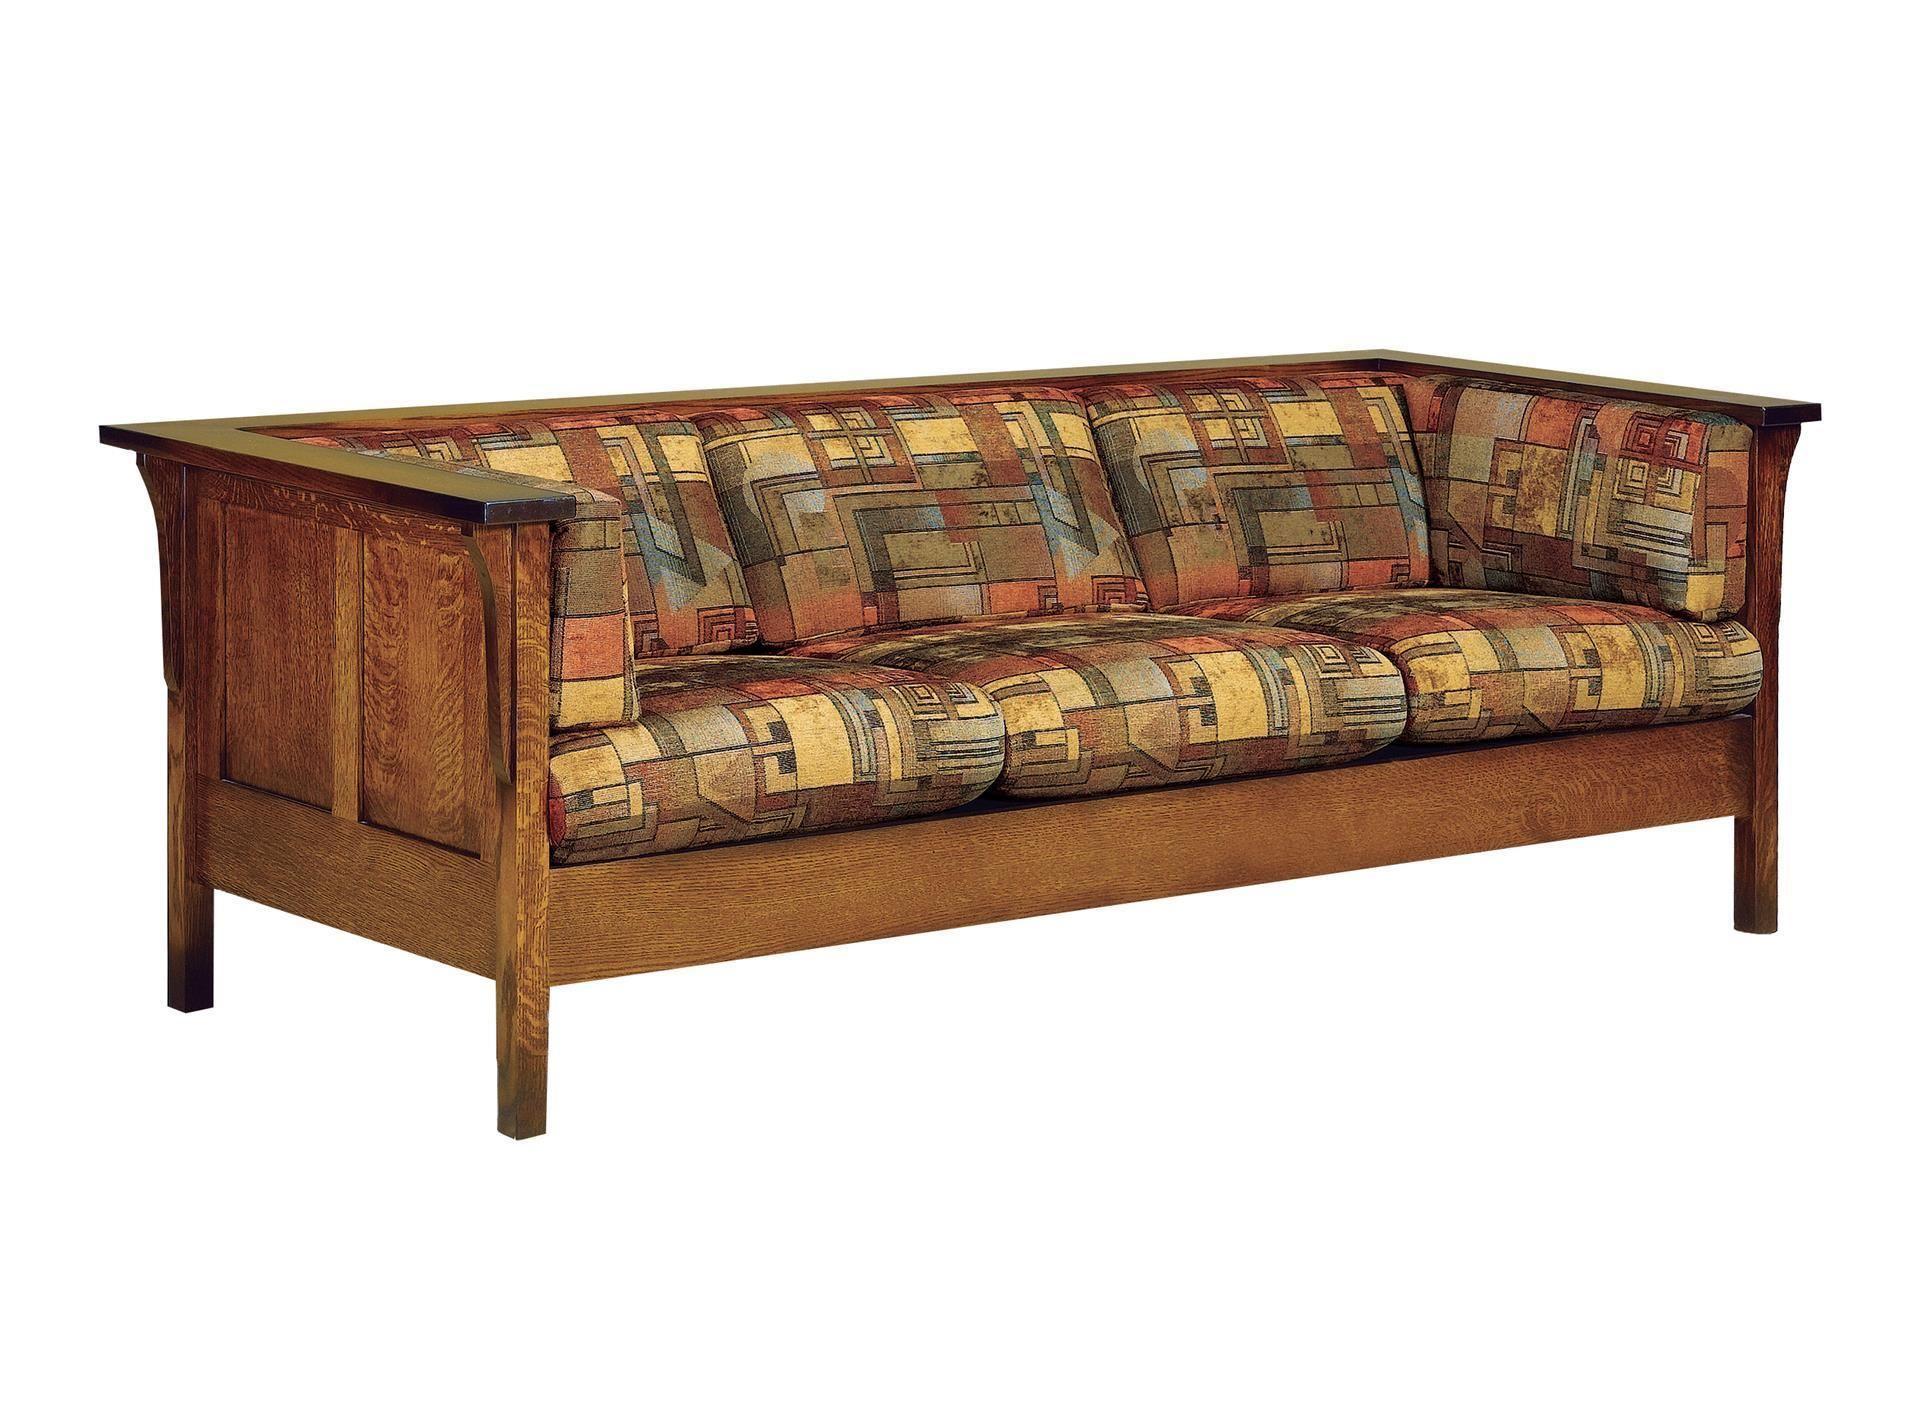 Amish Mission Cubic Panel Sofa | Furniture, Amish ...